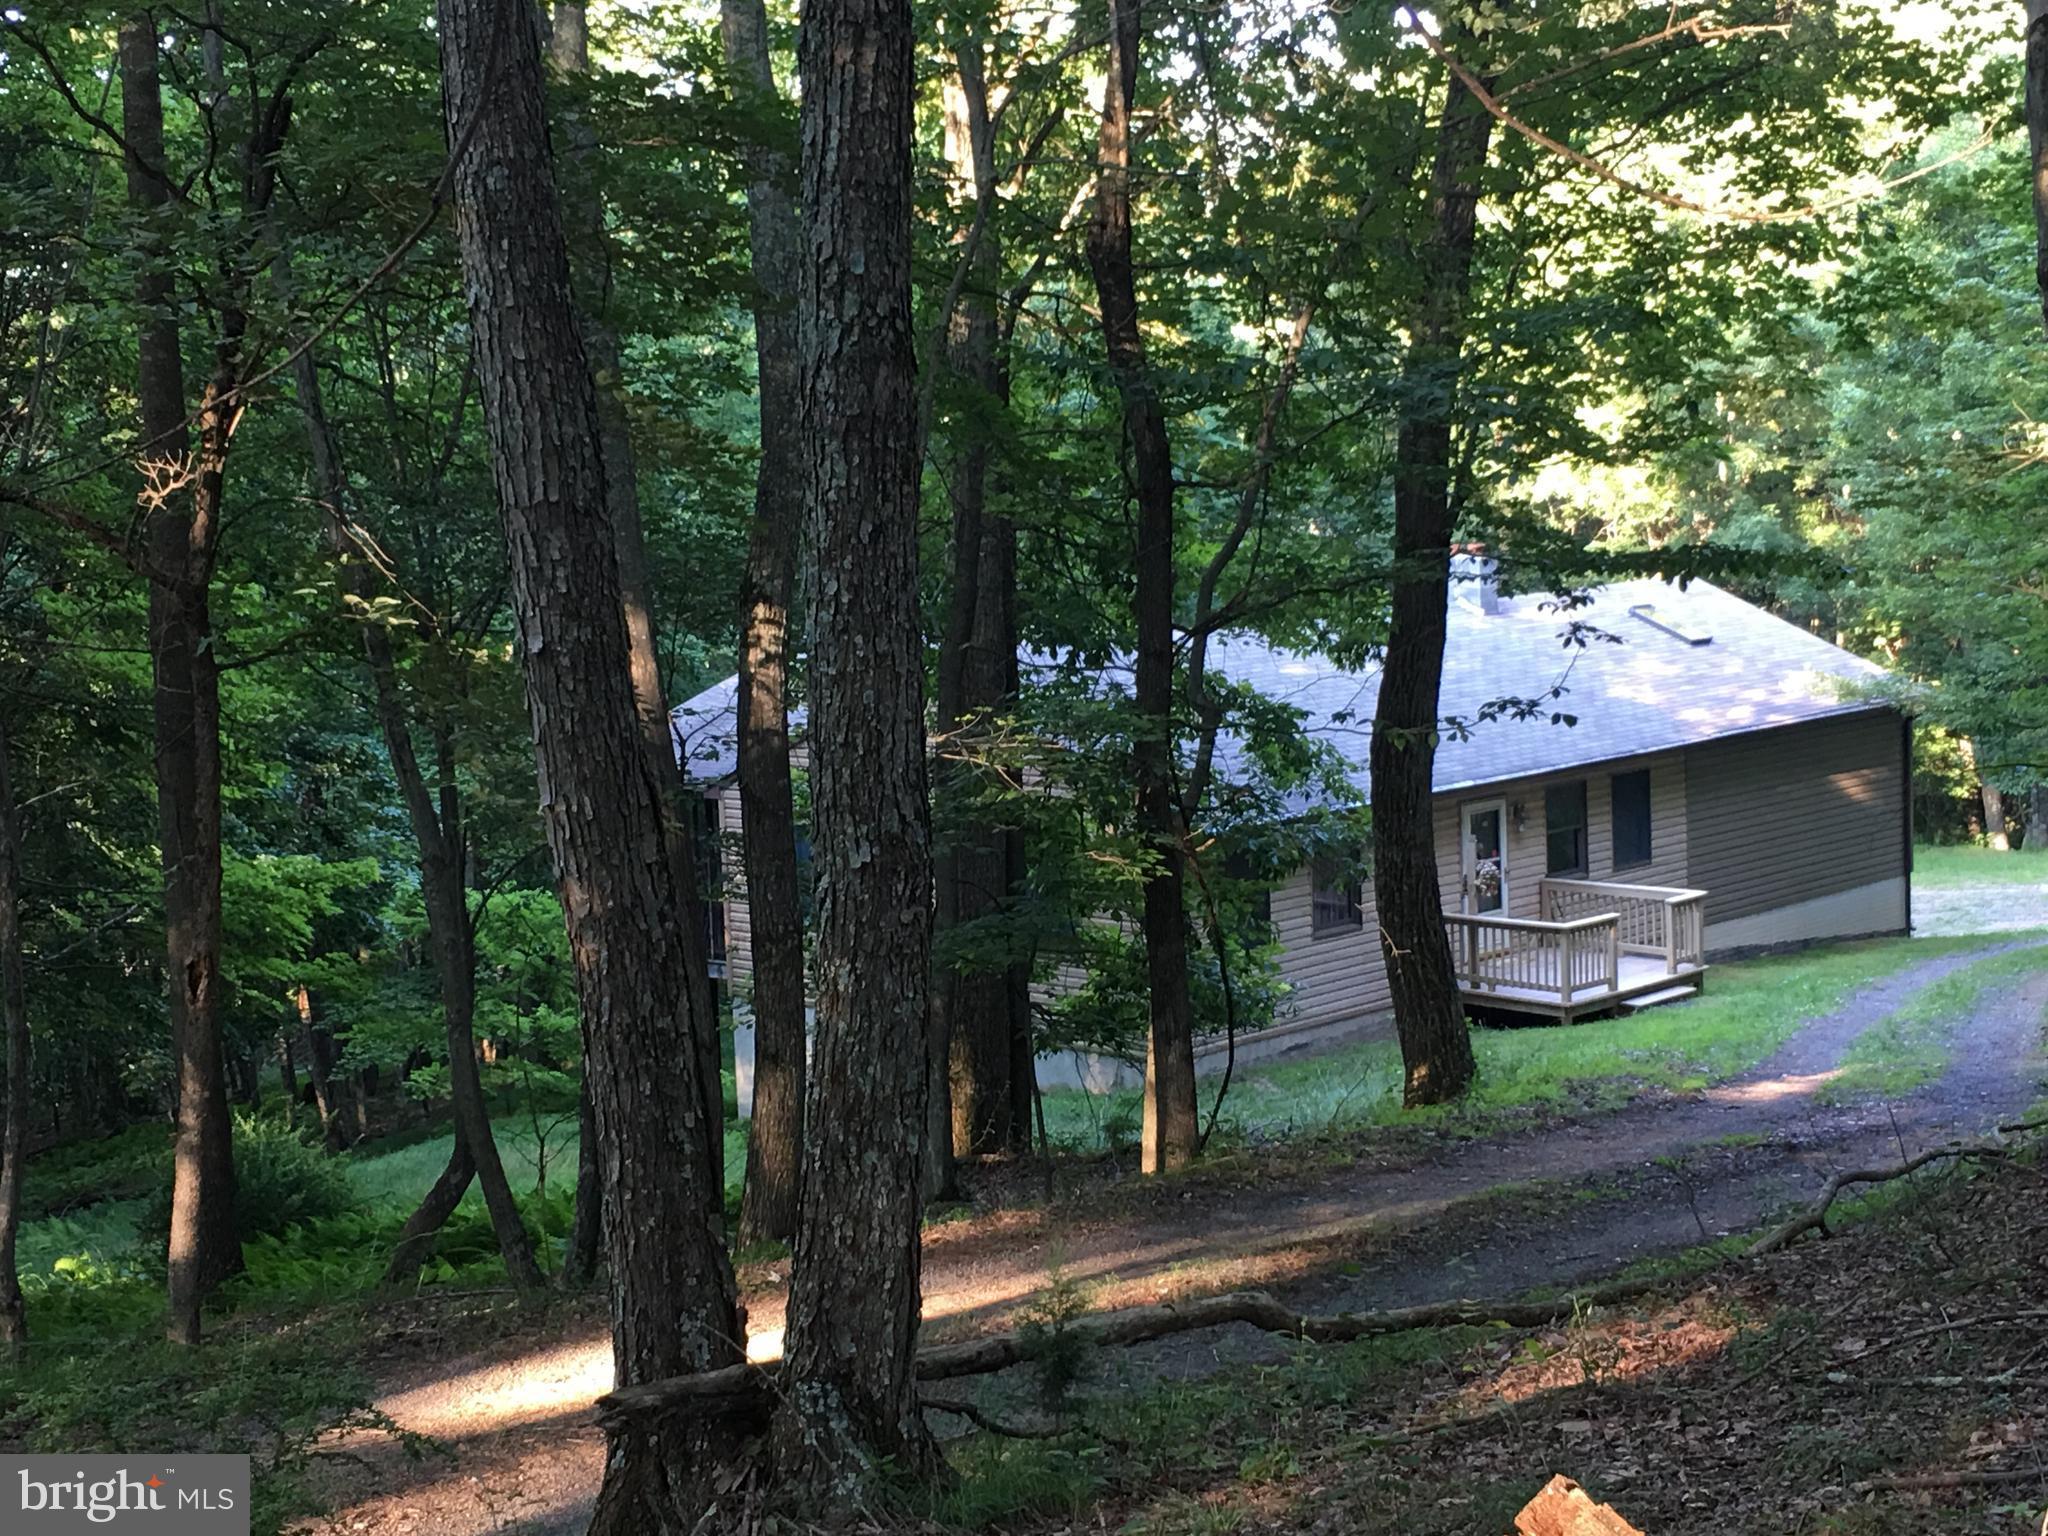 1002005100 Detached Real Estate 632 Triple Creek Road